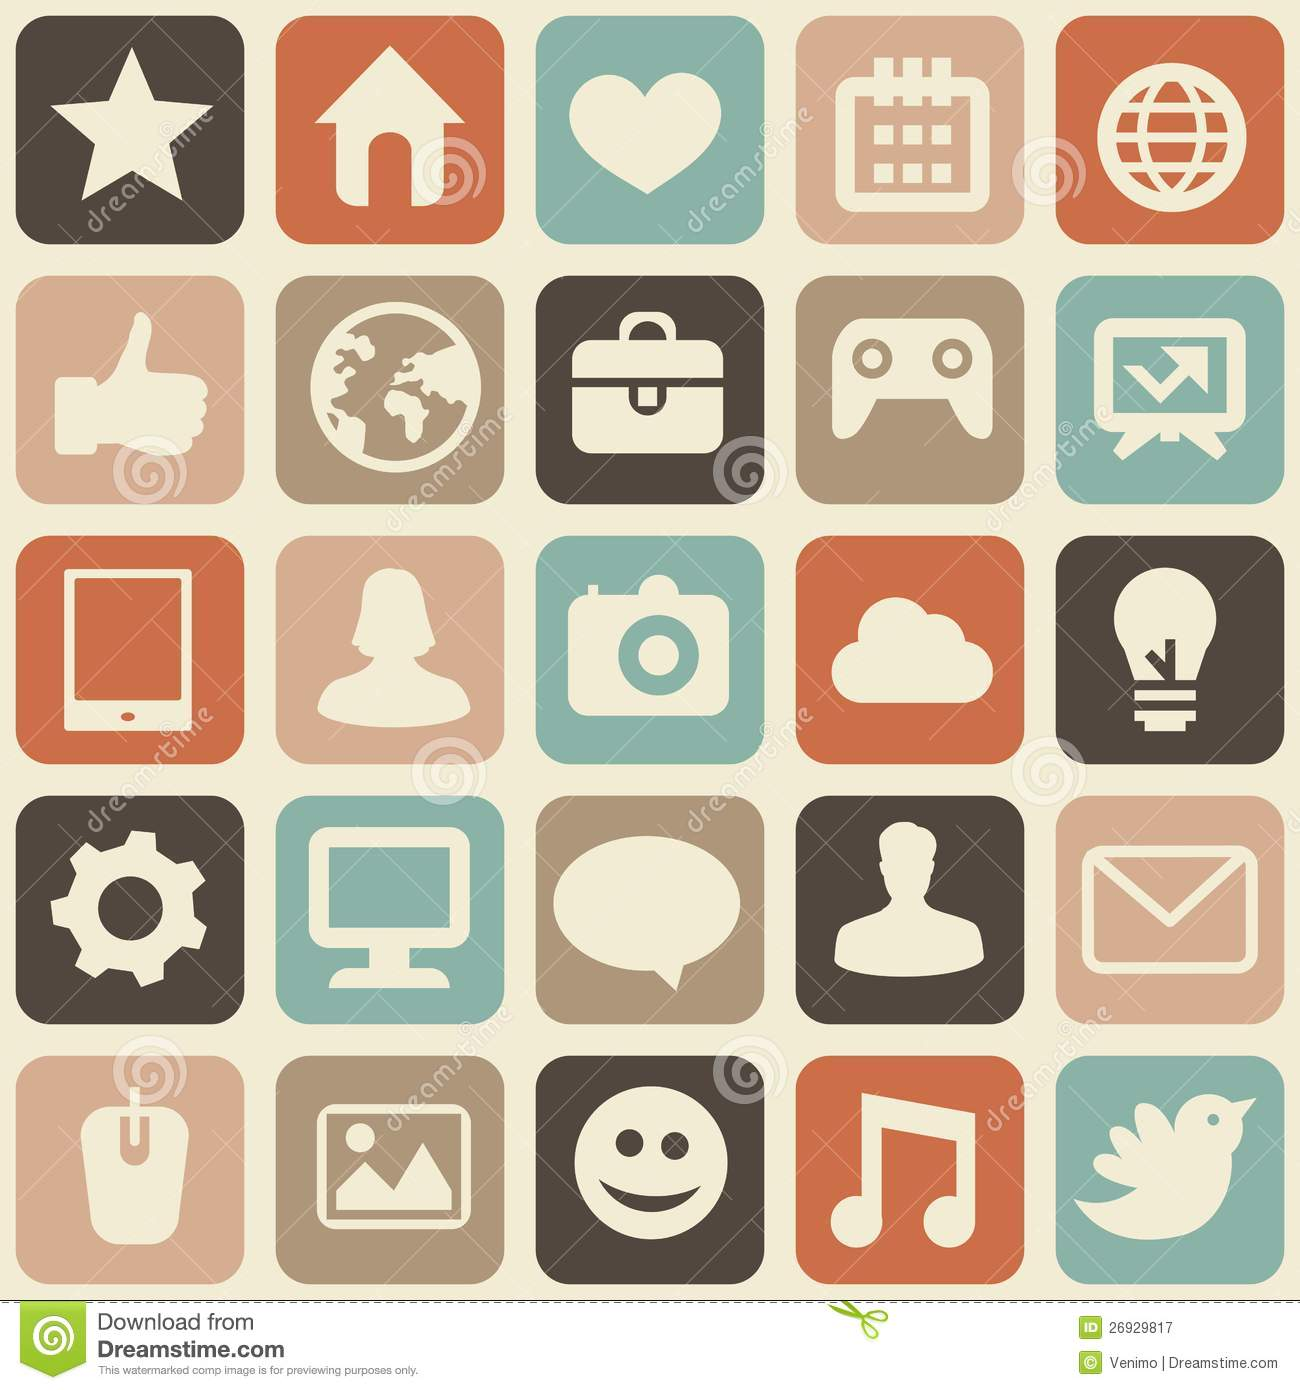 Social media logo clipart jpg royalty free Vector Seamless Pattern With Social Media Icons Royalty Free Stock ... jpg royalty free